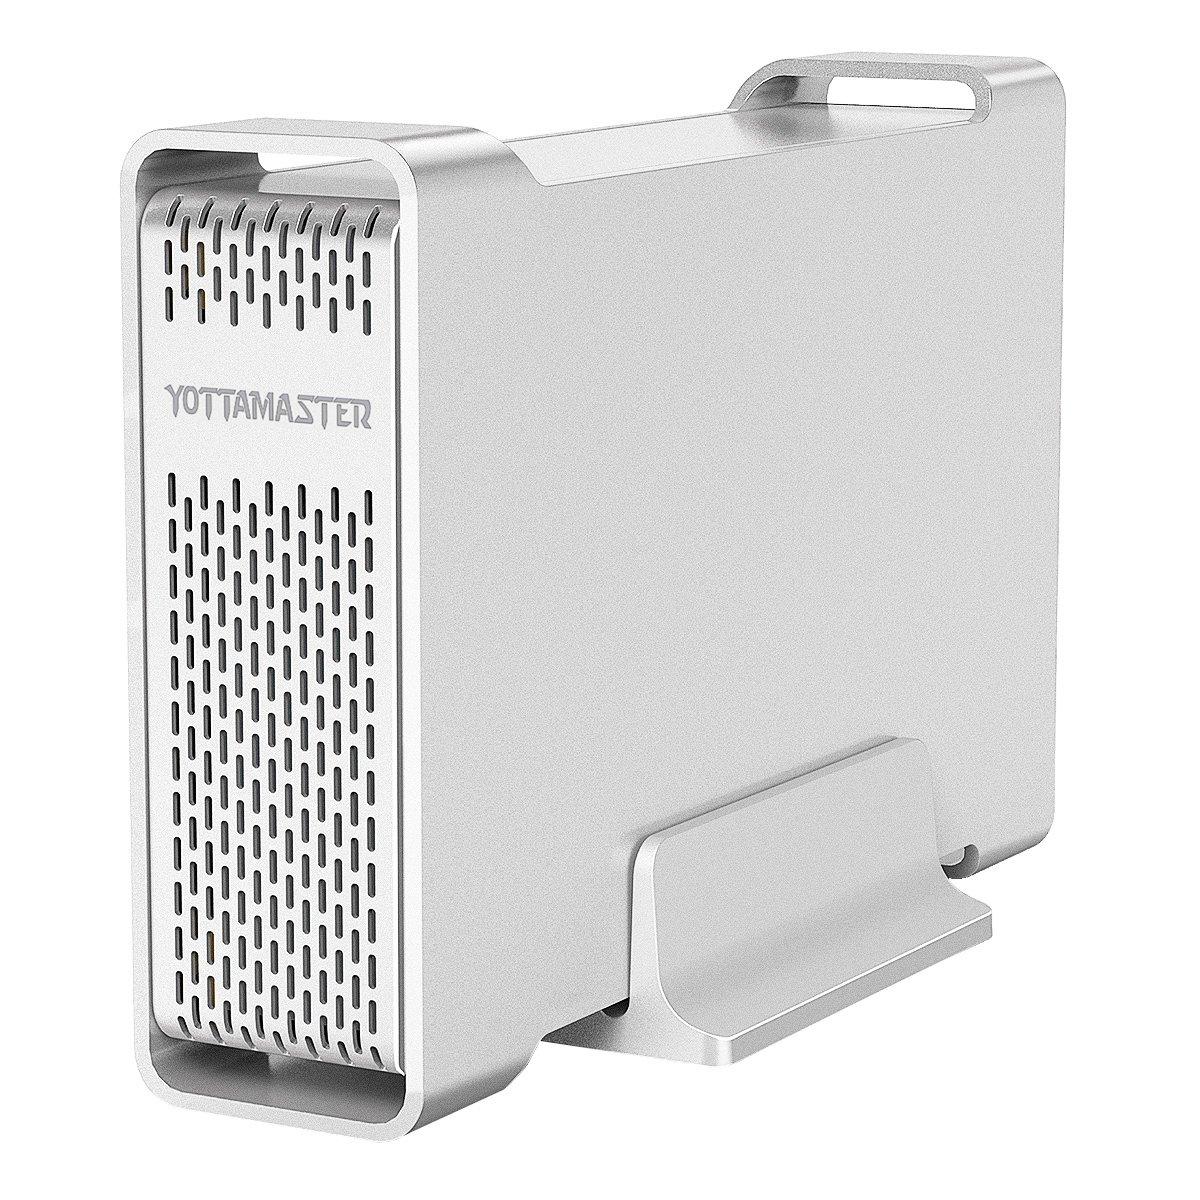 Aluminum YOTTAMASTER USB3.0 Hard Drive Enclosure 10TB for 3.5' SATA HDD [Support UASP]. Yottamaster Technology Co. Ltd